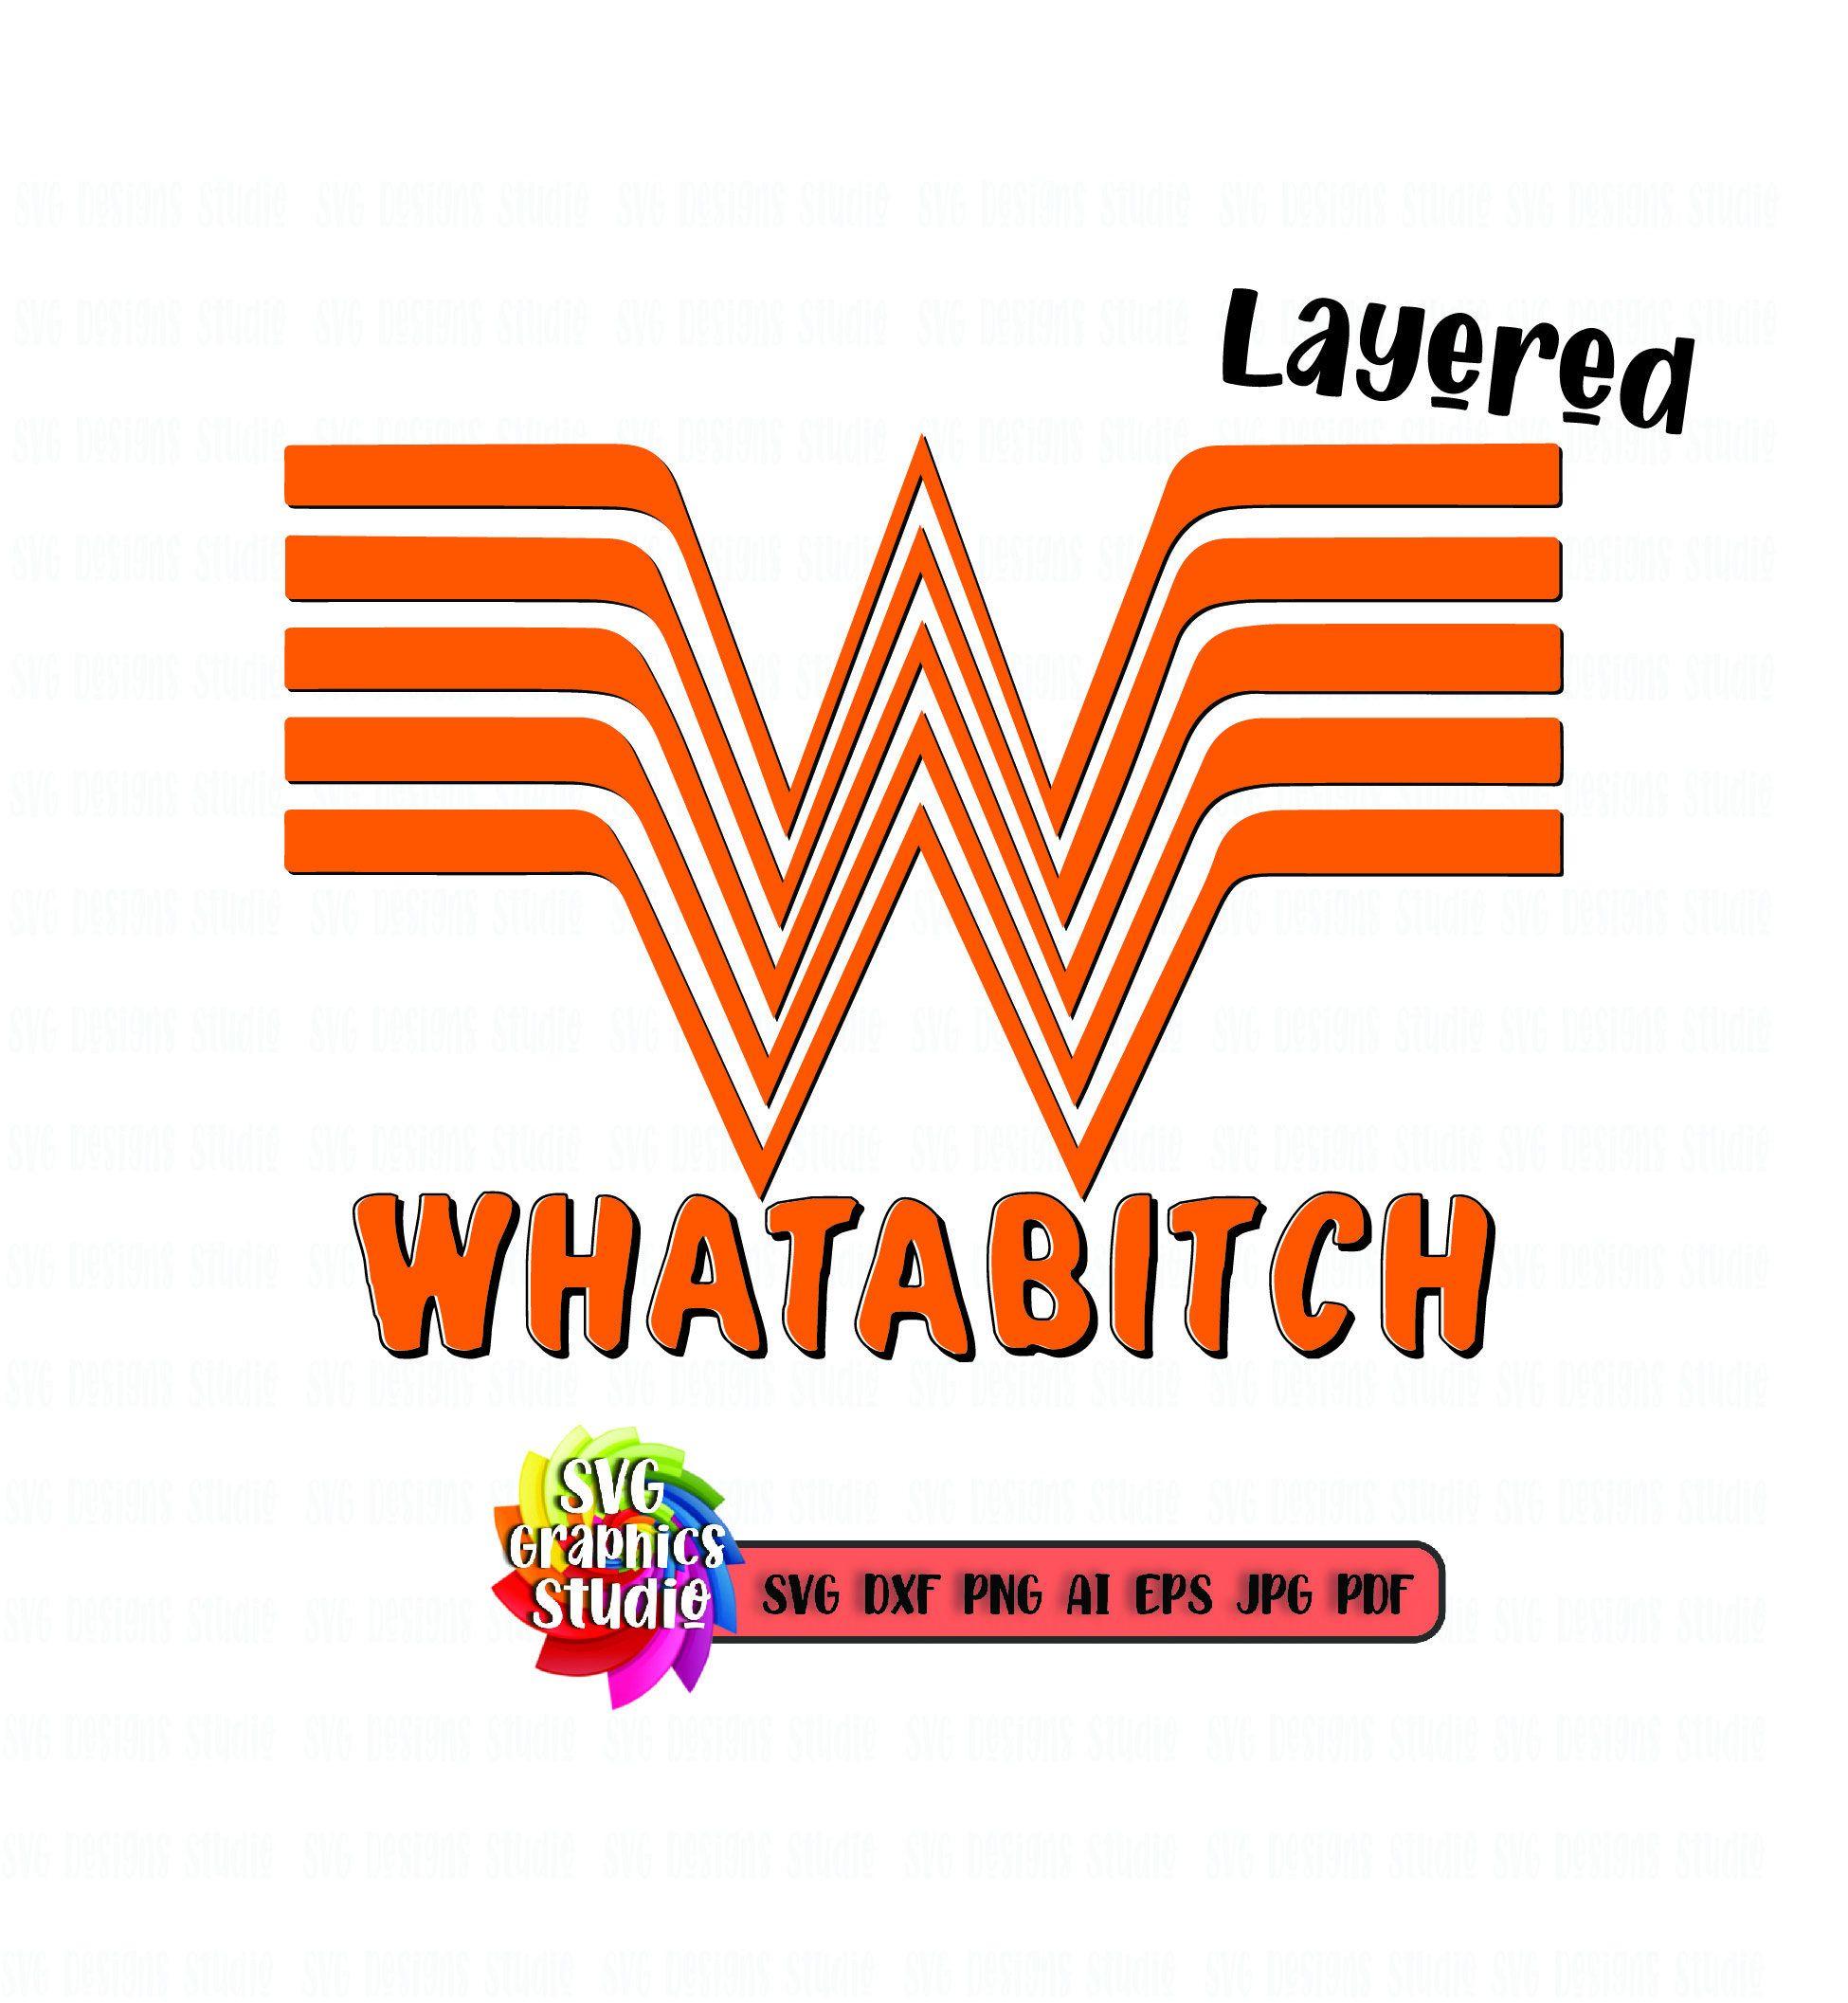 Whataburger Svg Whatabitch Svg Funny Wataburger Sublimation Waterslides Svg For Cricut Silhouette Png Dxf Wataburger Logo Layered Svg Whataburger Dxf